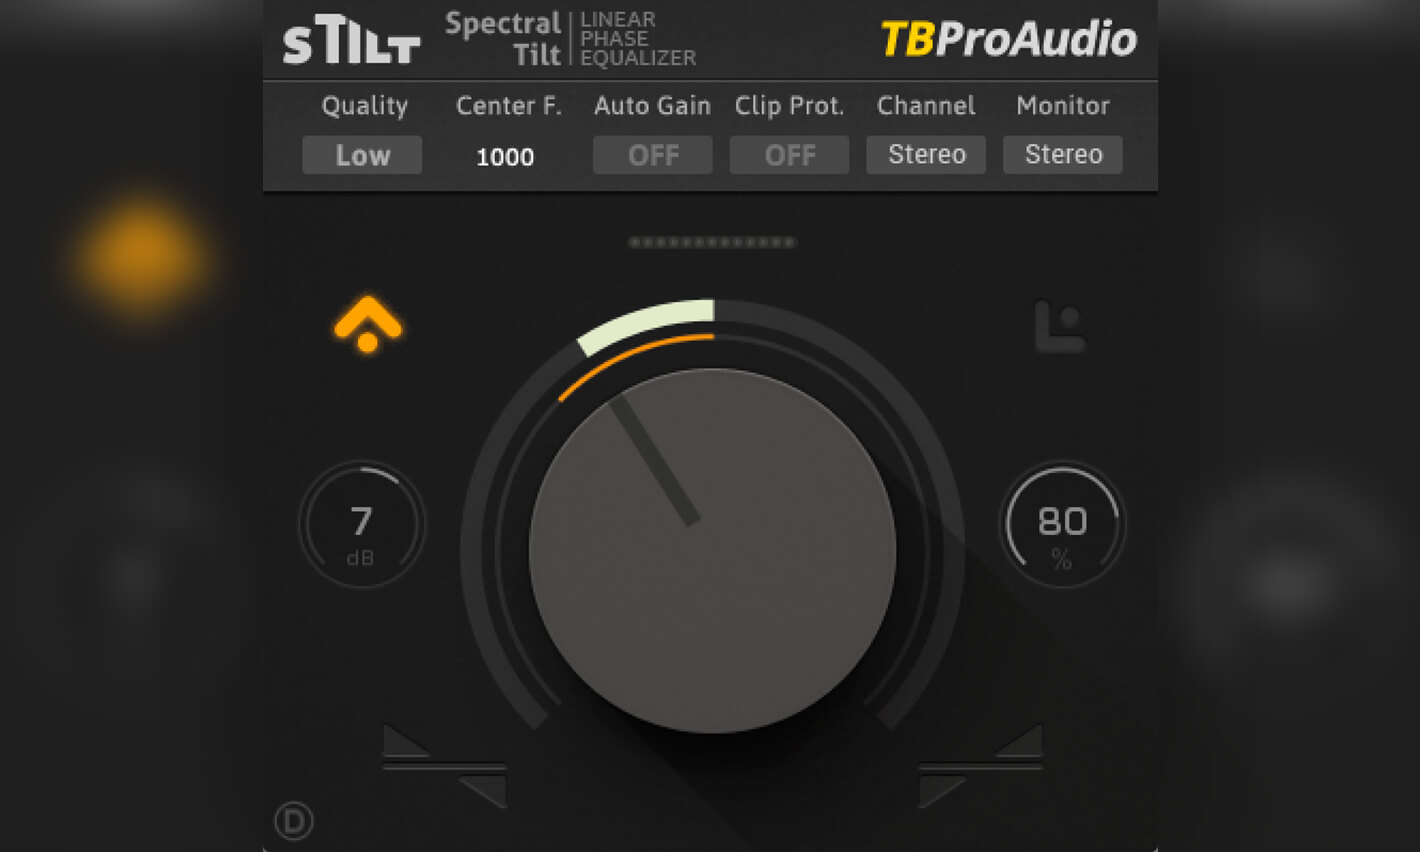 TBProAudio sTilt Review